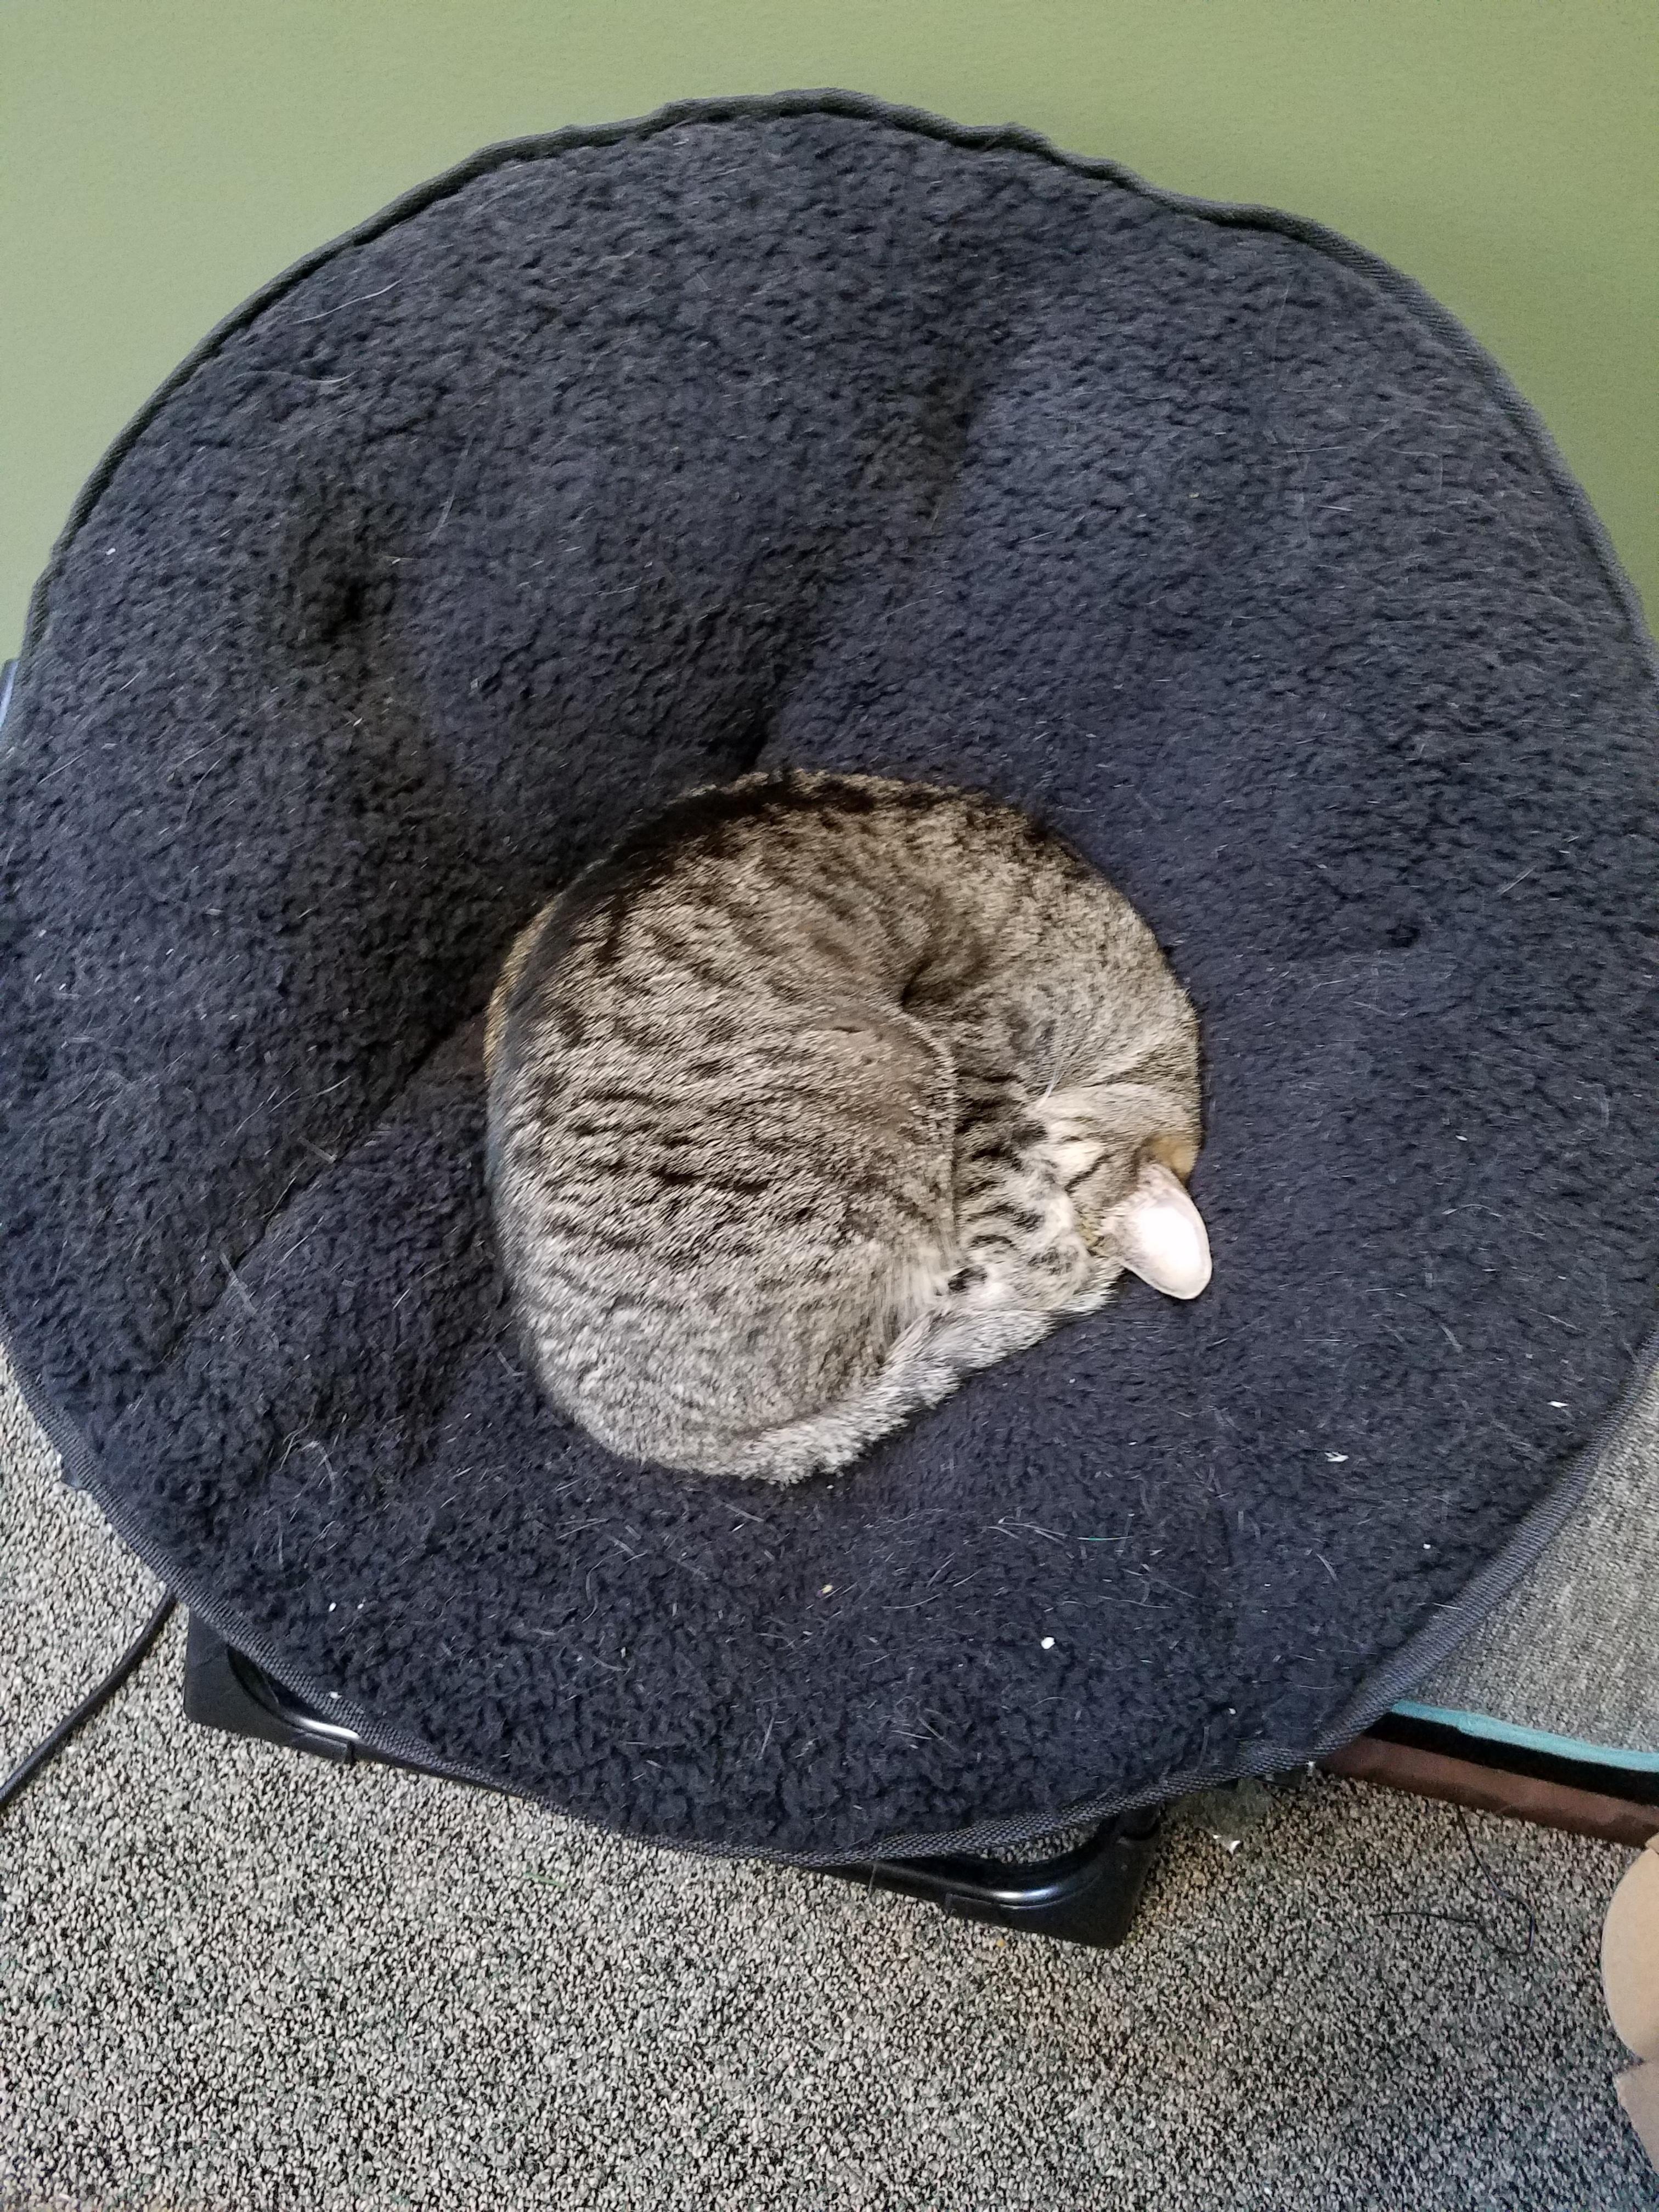 I Bought My Cat A Kid Sized Papasan Chair Http://ift.tt